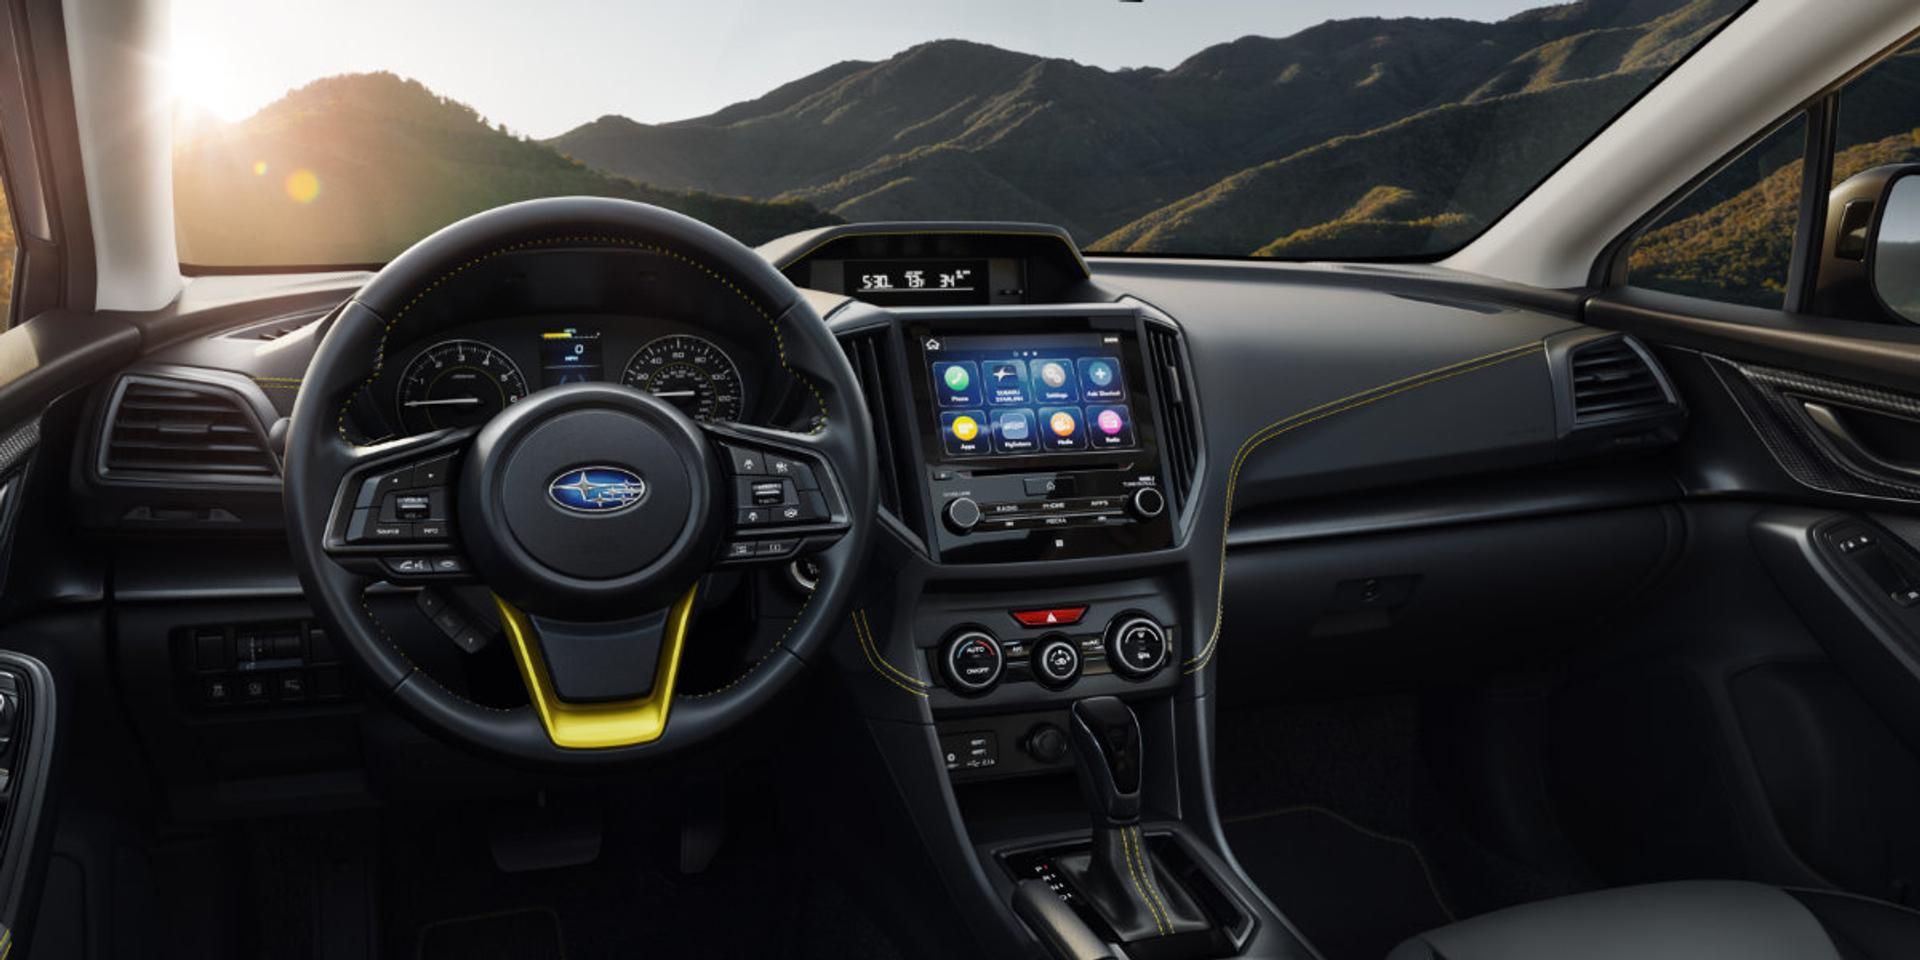 Subaru Crosstrek interior